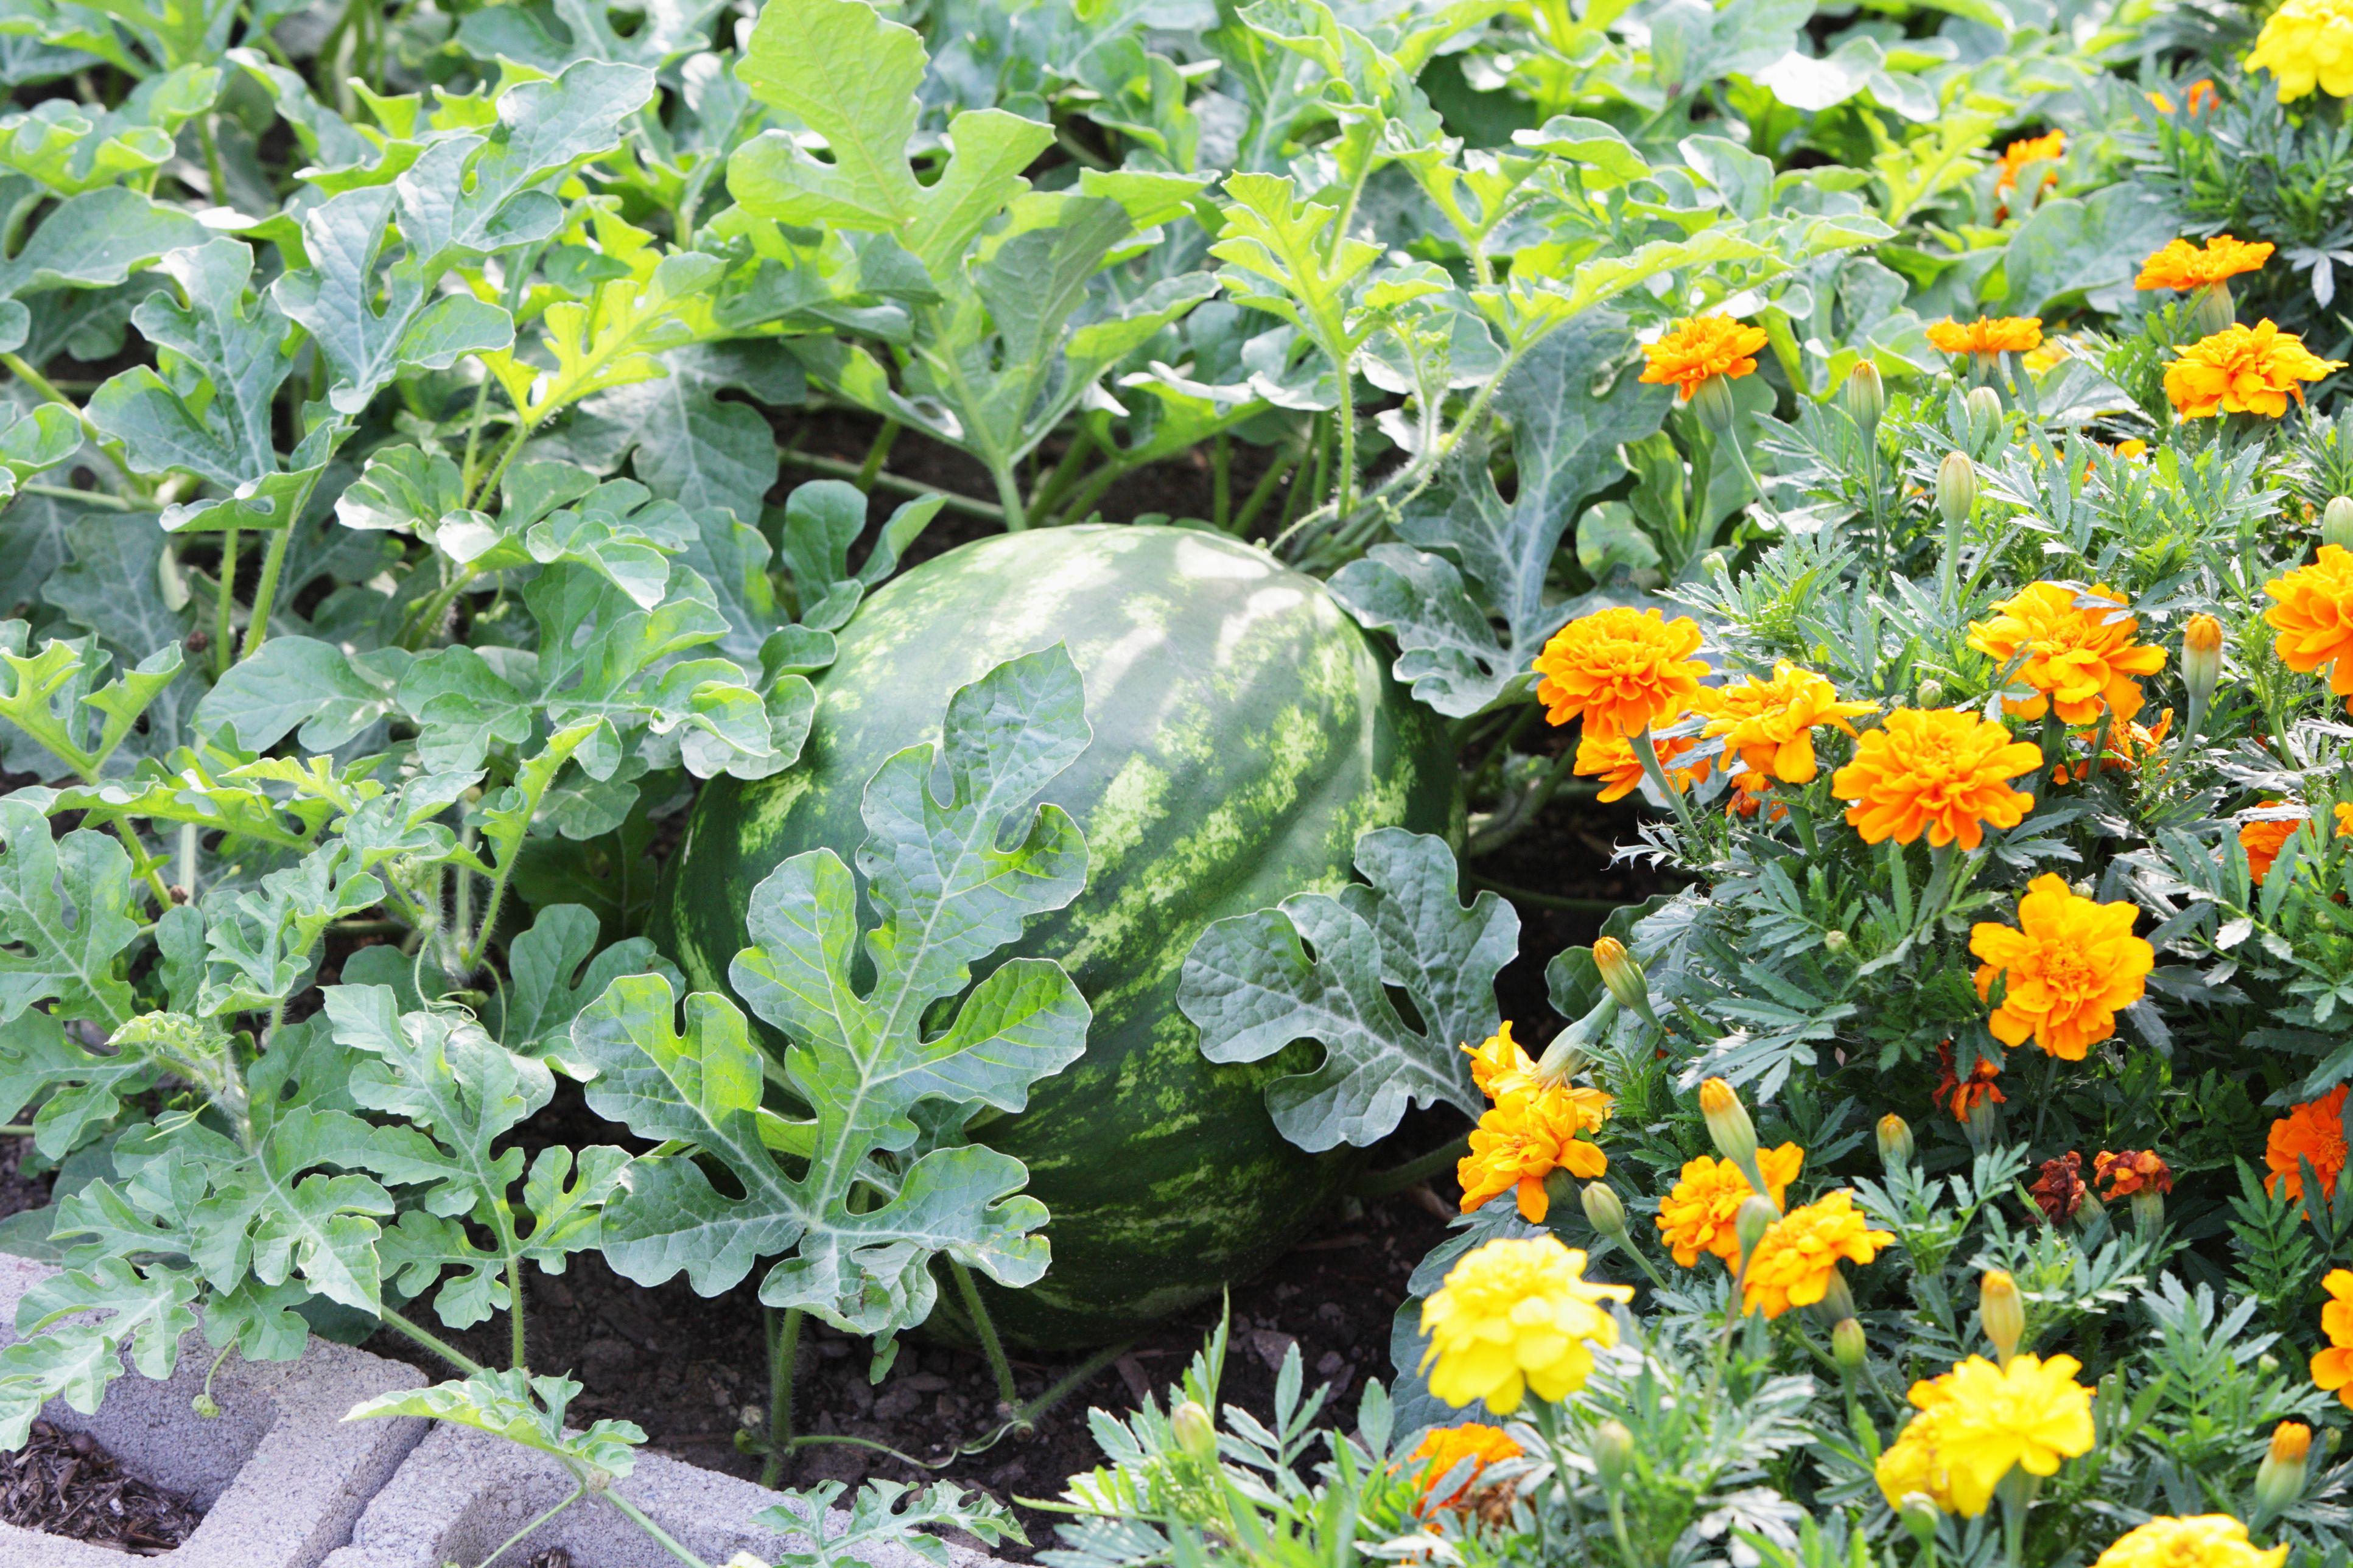 Big Ripe Watermelon Citrullus Lanatus In A Summer Garden